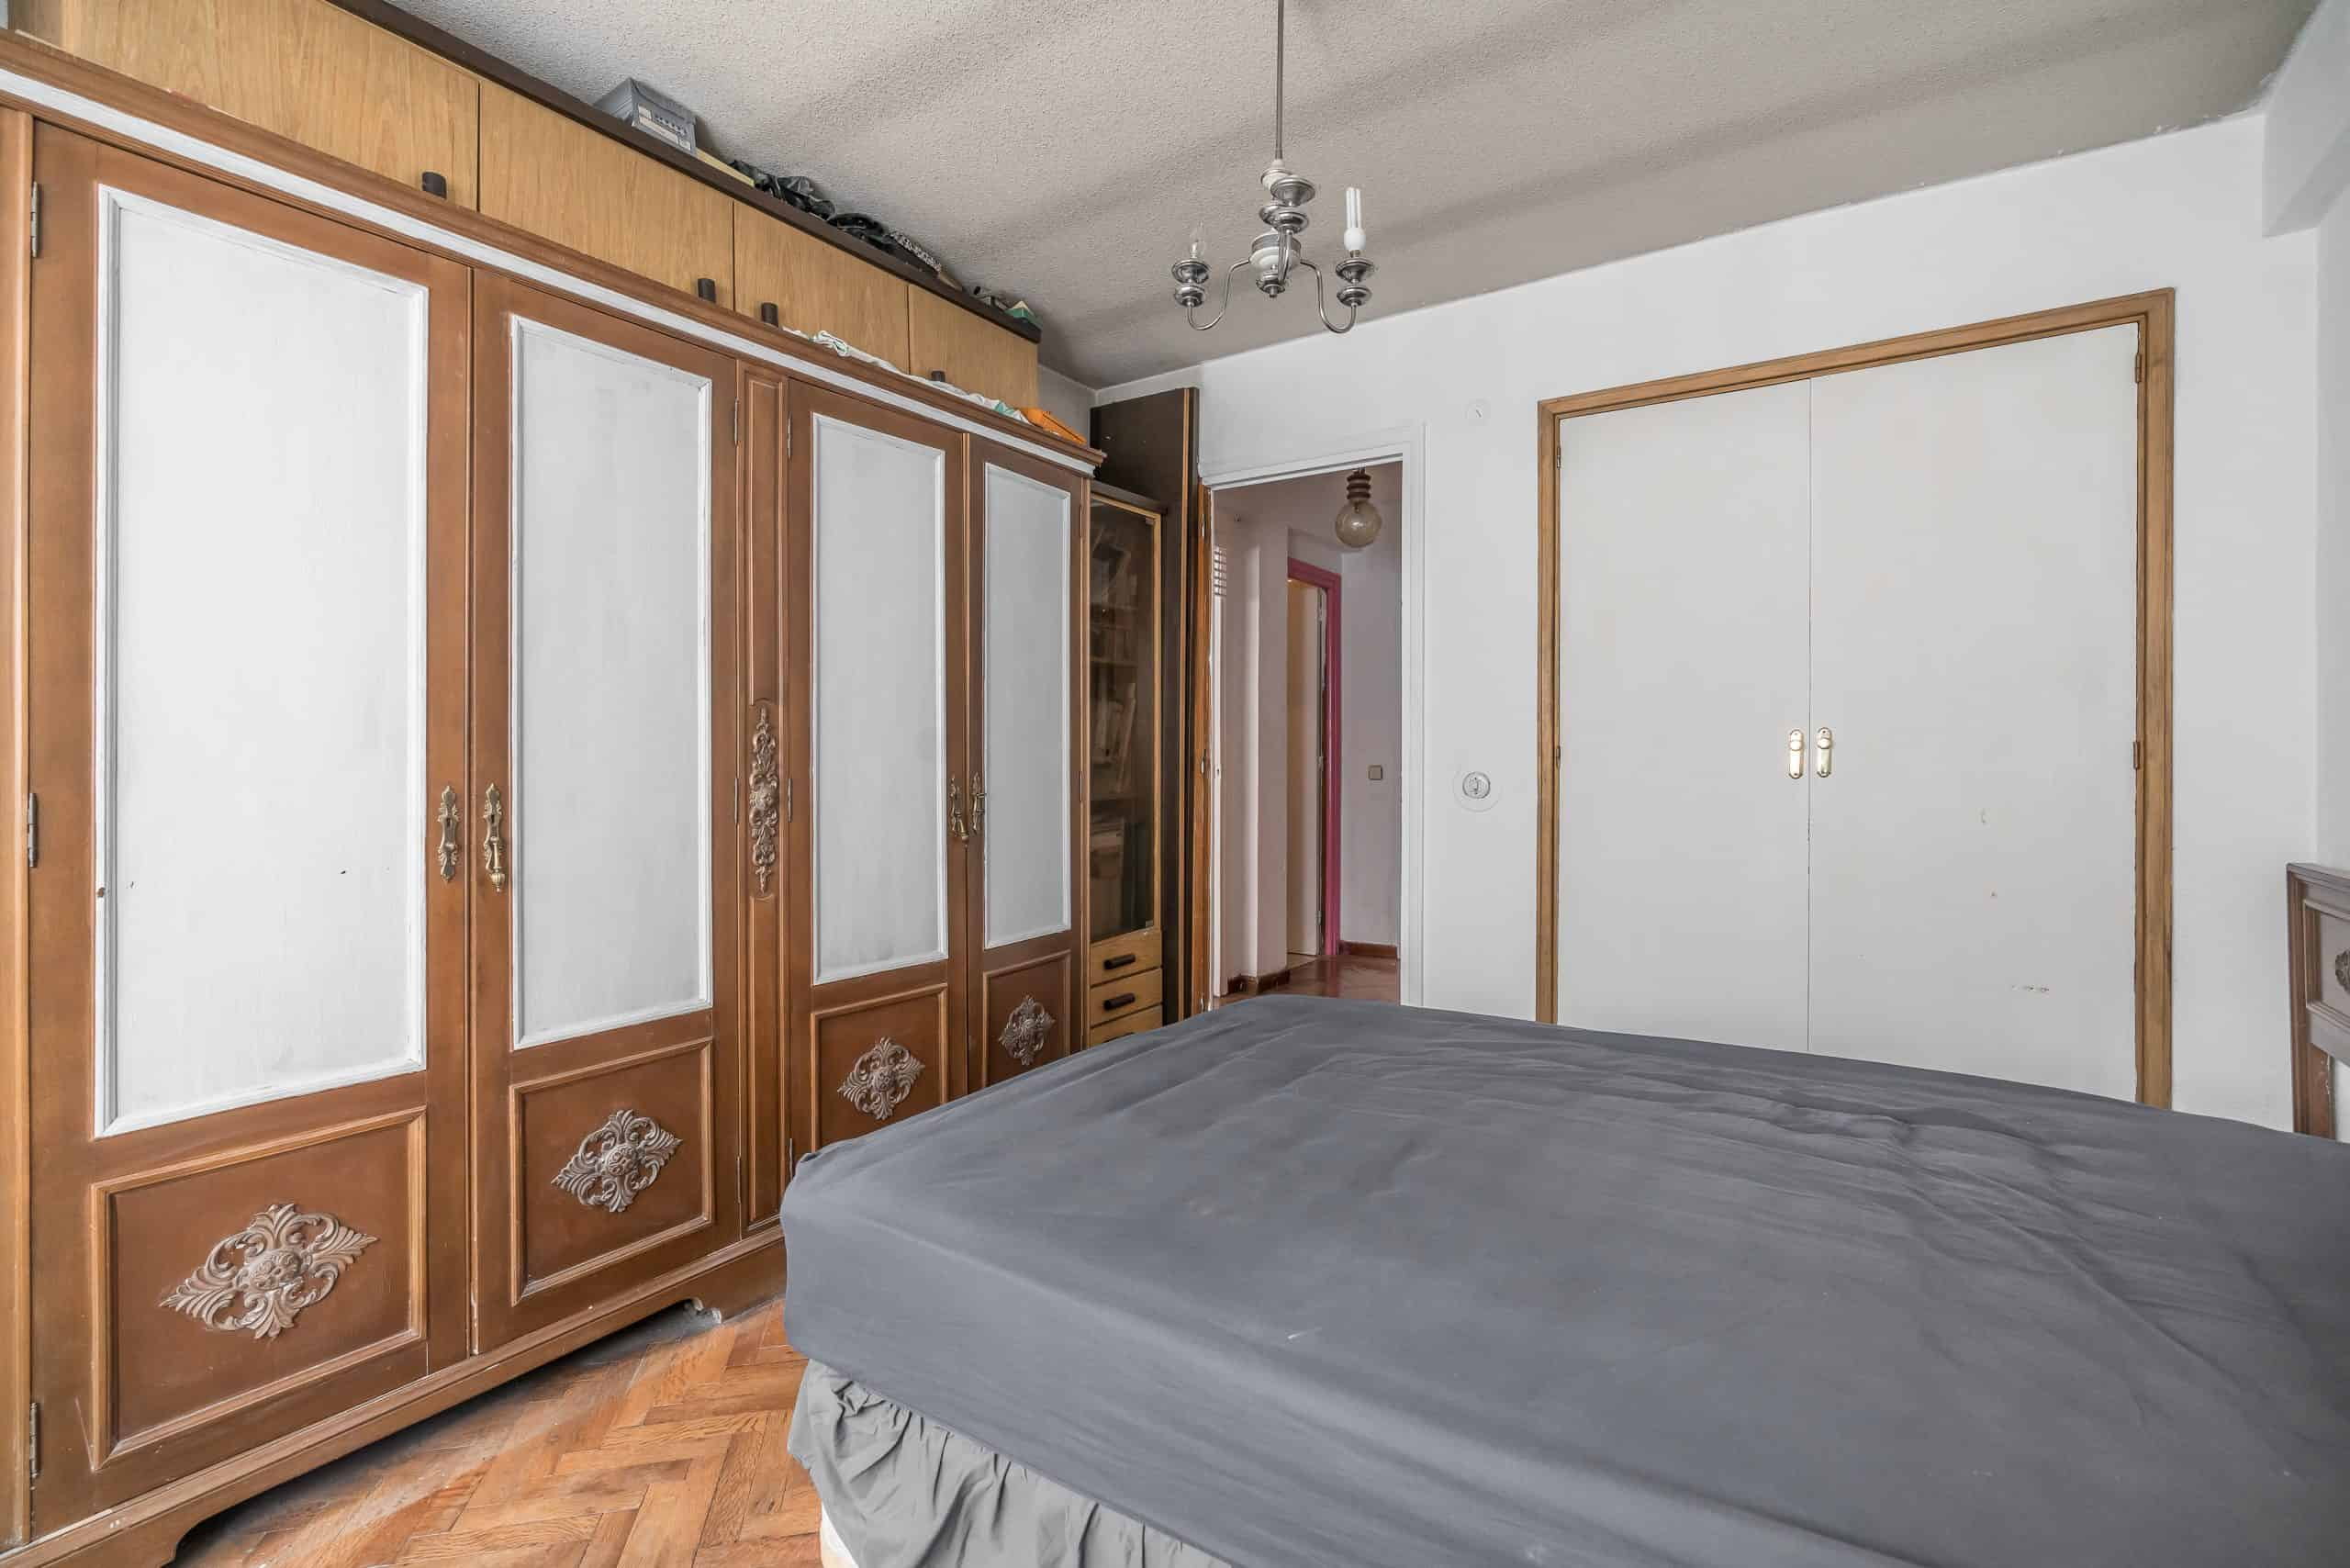 Agencia Inmobiliaria de Madrid-FUTUROCASA-calle Alcala- dormitorio 1.1